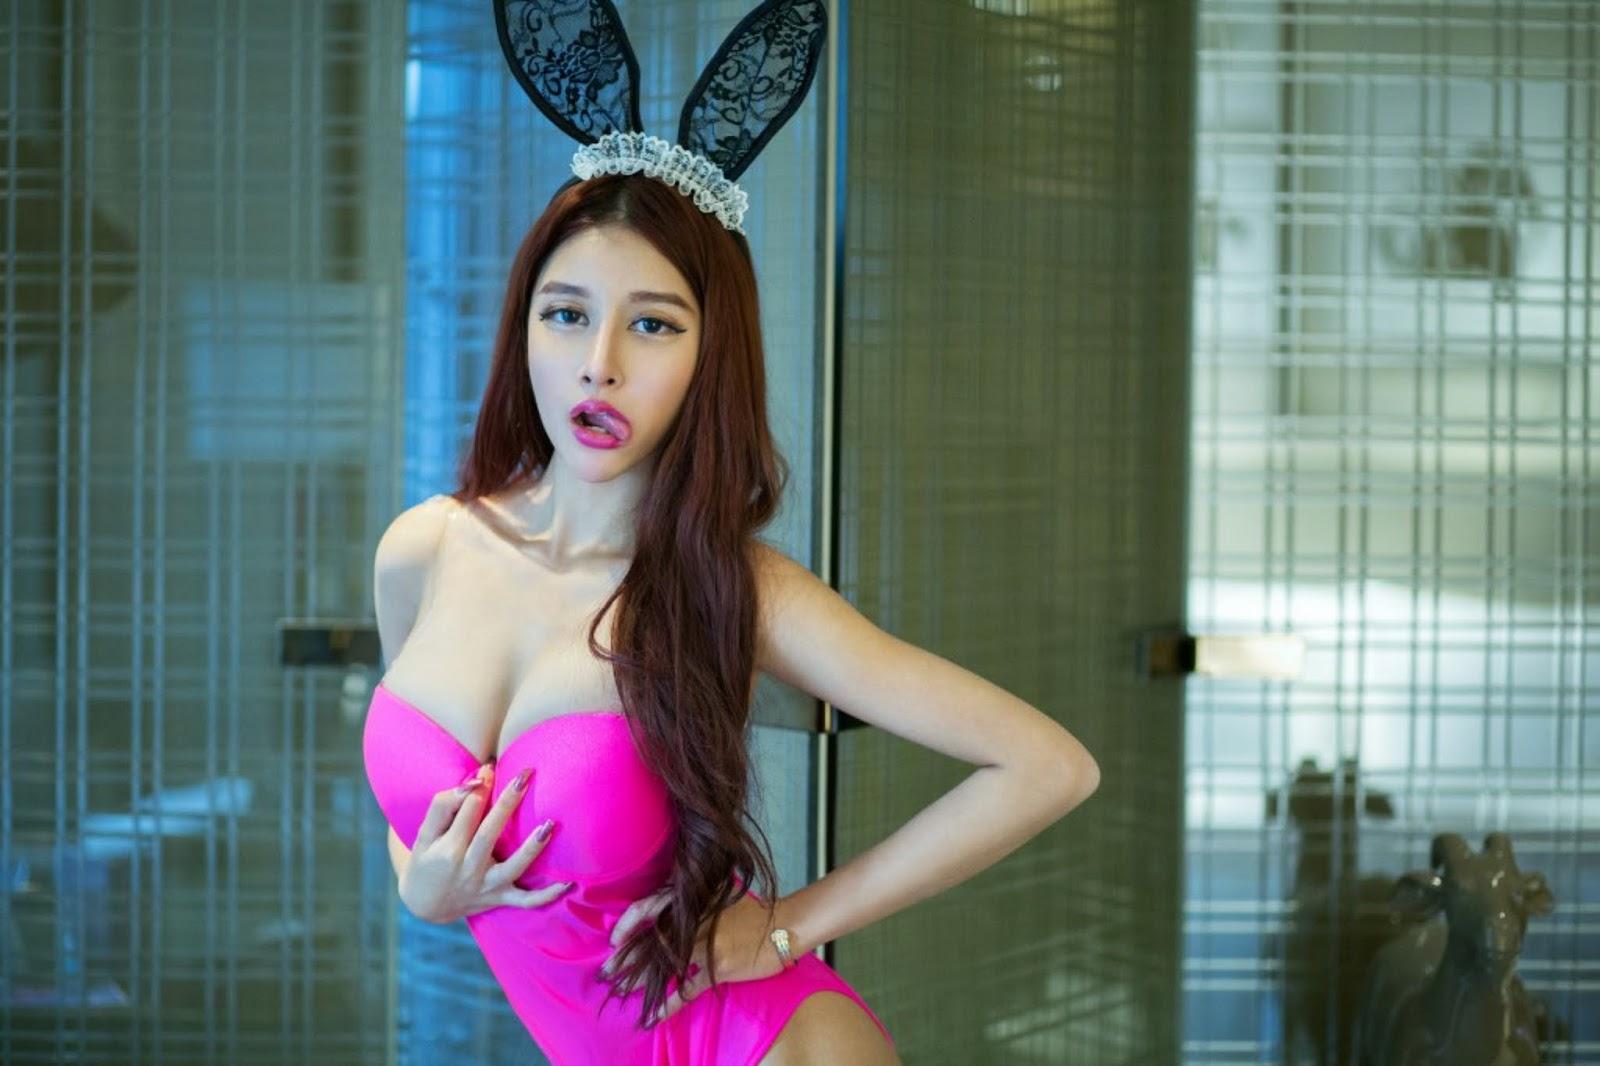 %25C2%25B1 %25C2%25B1 16 - Model Nude TUIGIRL NO.49 Beauty Body Tits